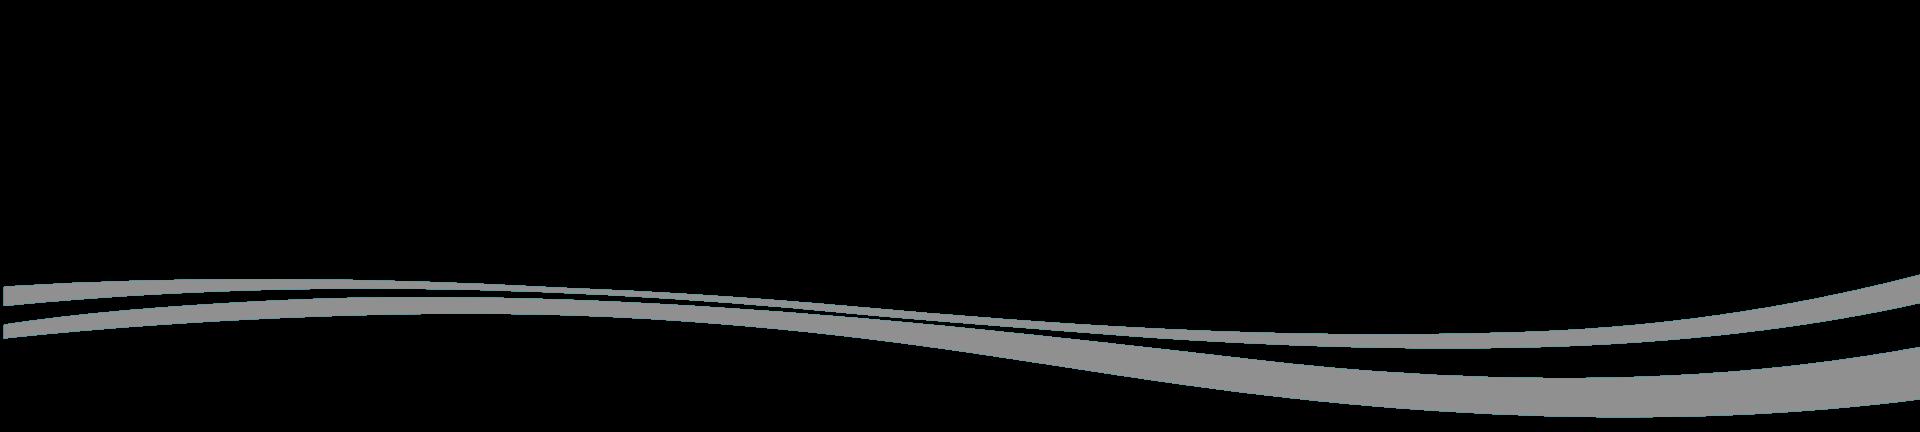 Orlando-Sentinel-logo.png